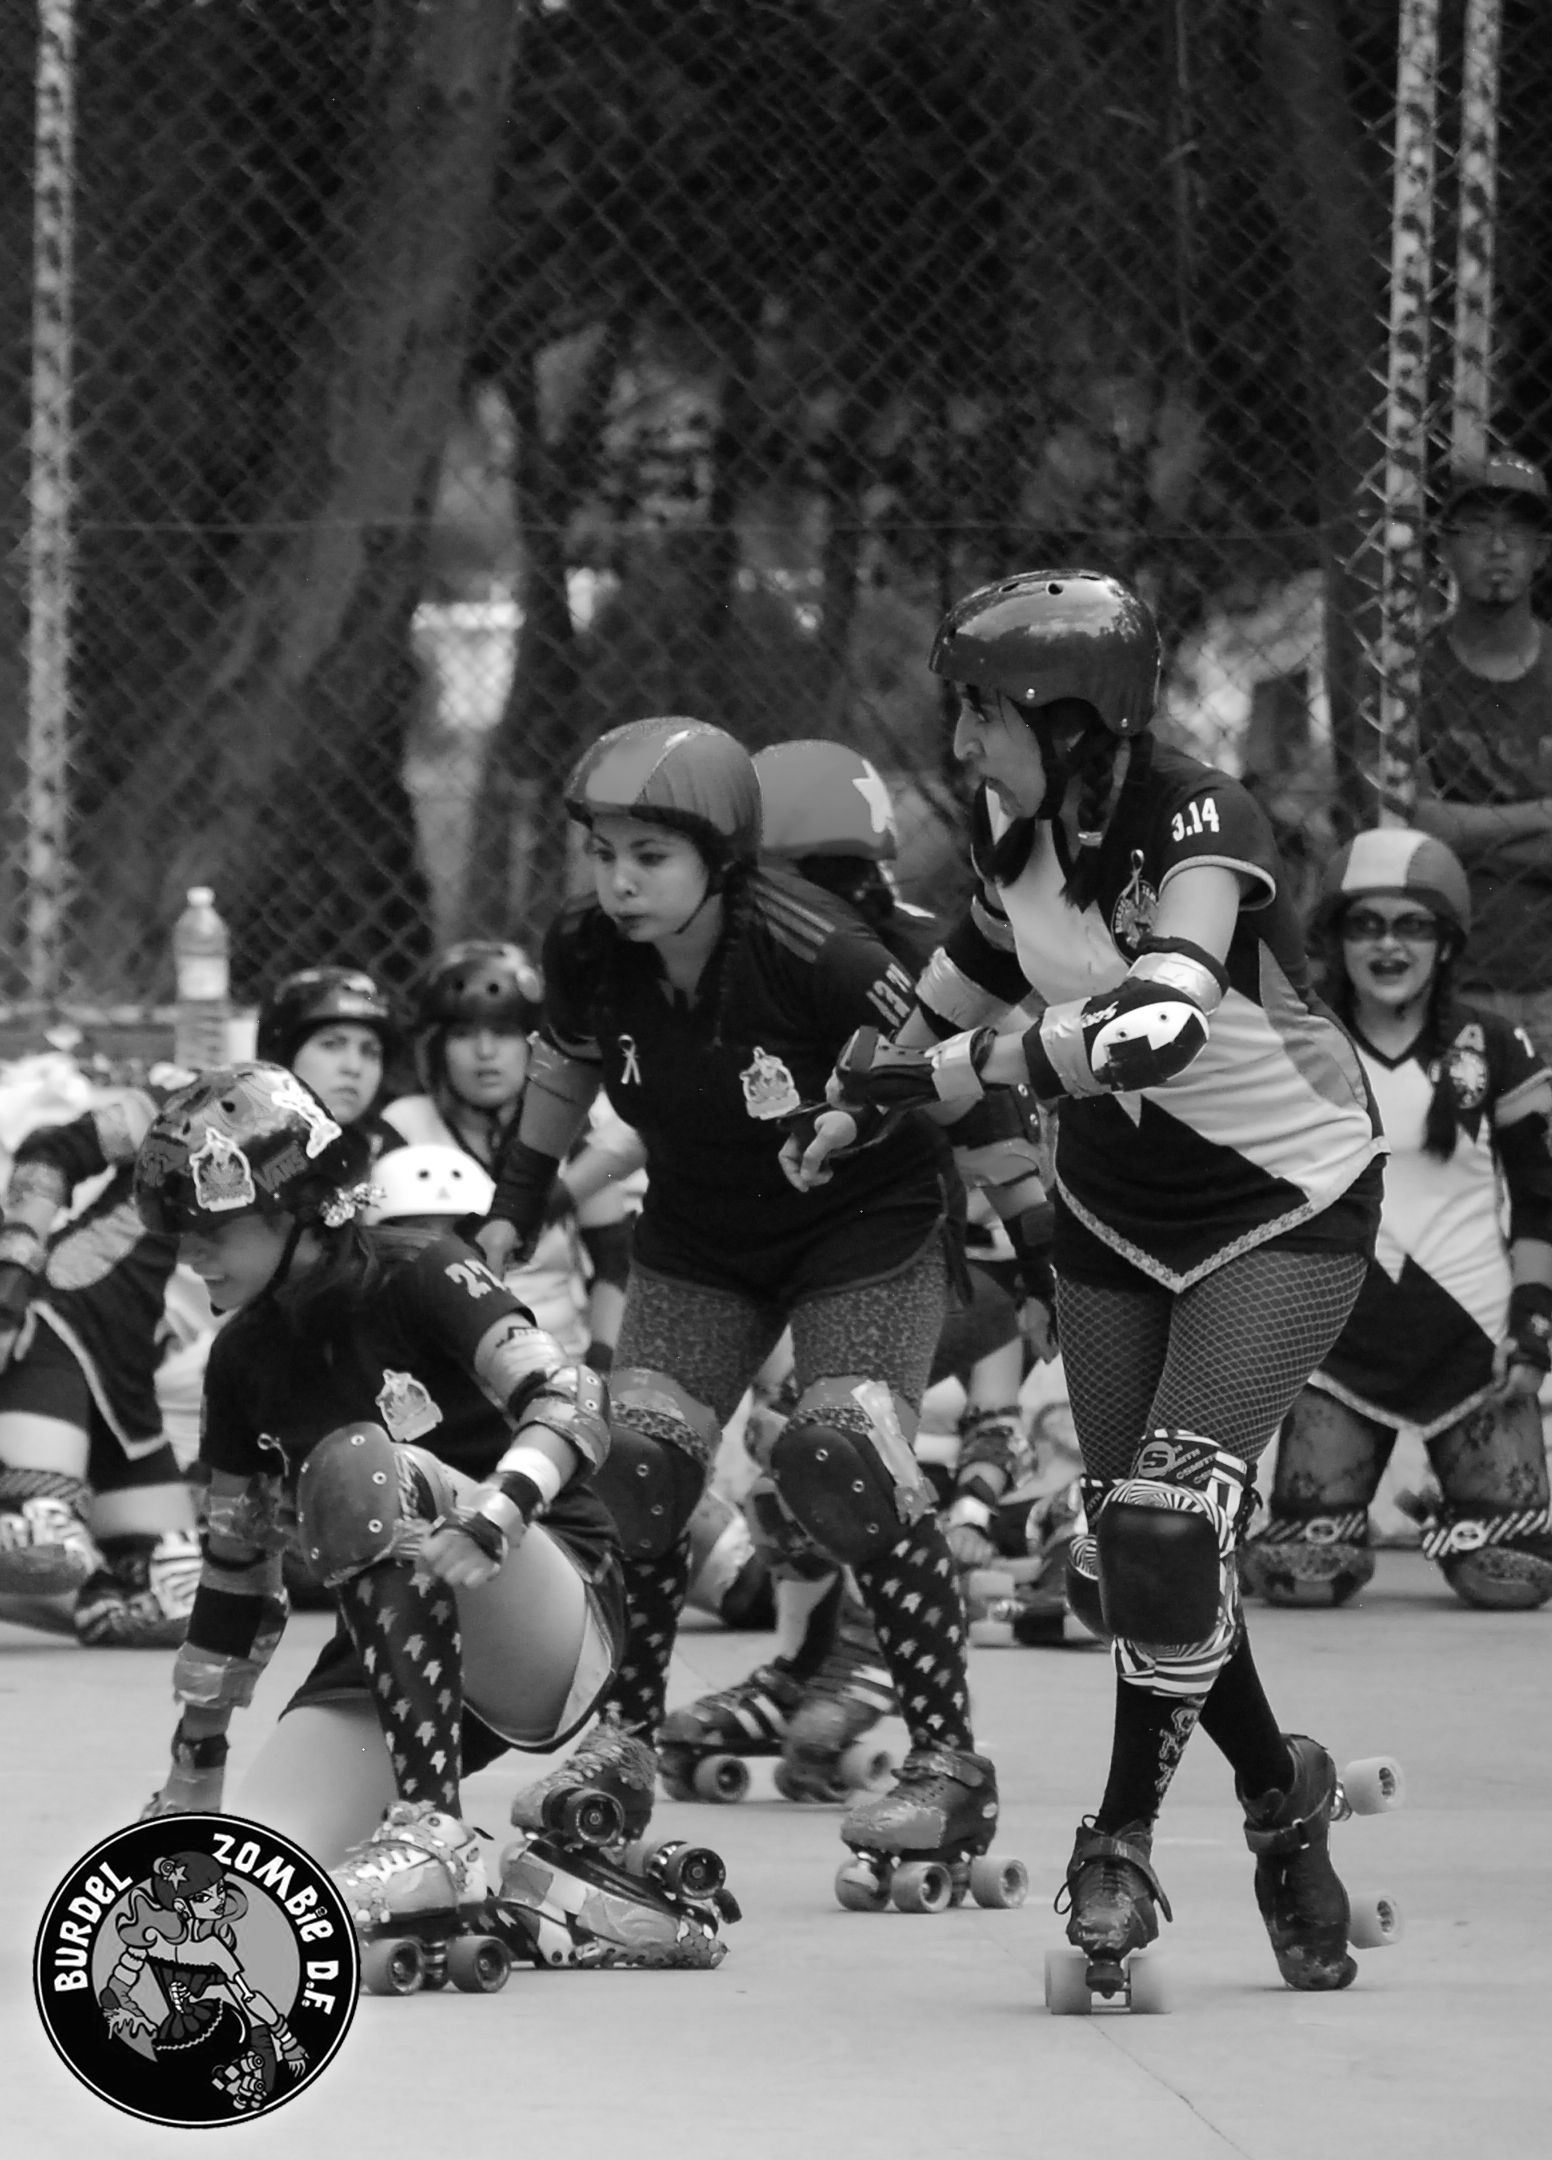 Roller skating rink northern va - Rollers